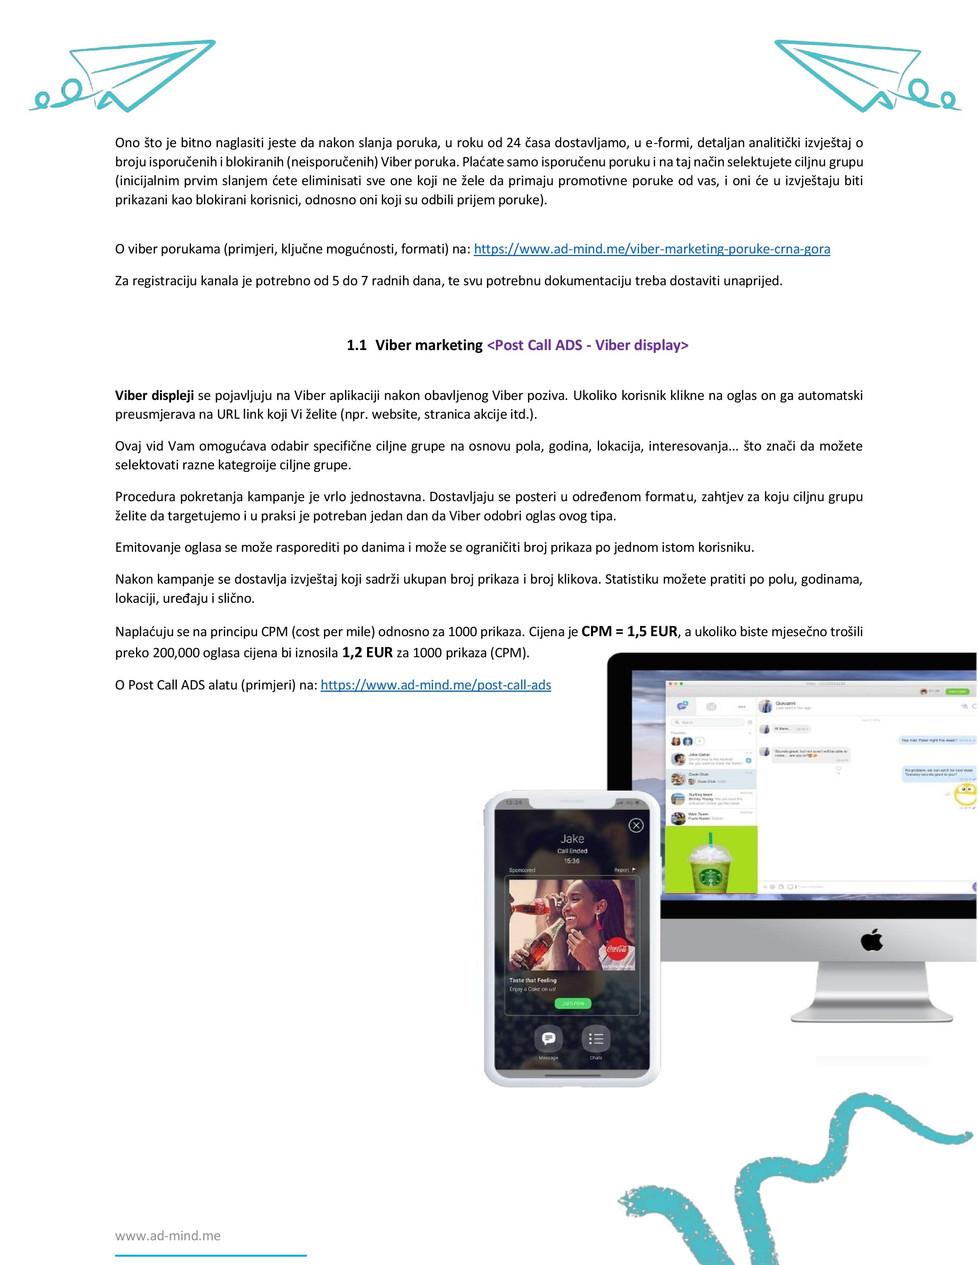 Viber marketing (1)-page-002.jpg